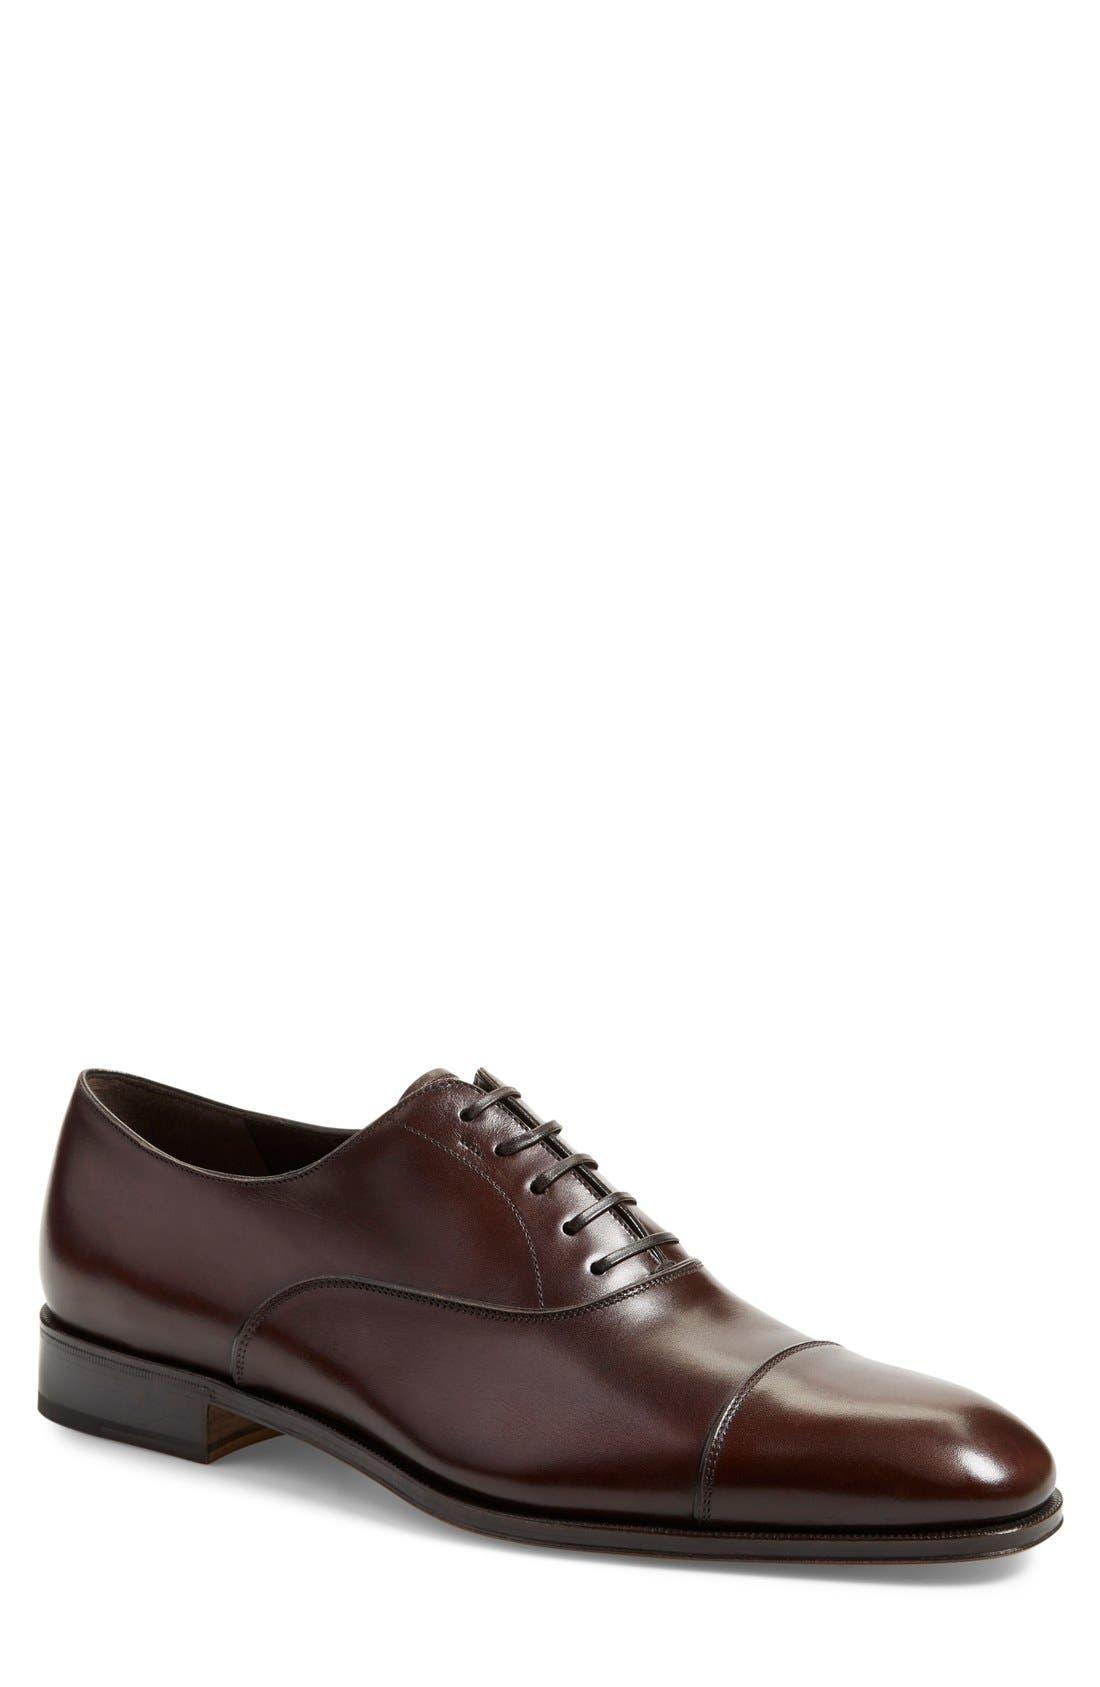 Luce Cap Toe Oxford,                             Main thumbnail 1, color,                             Auburn Leather